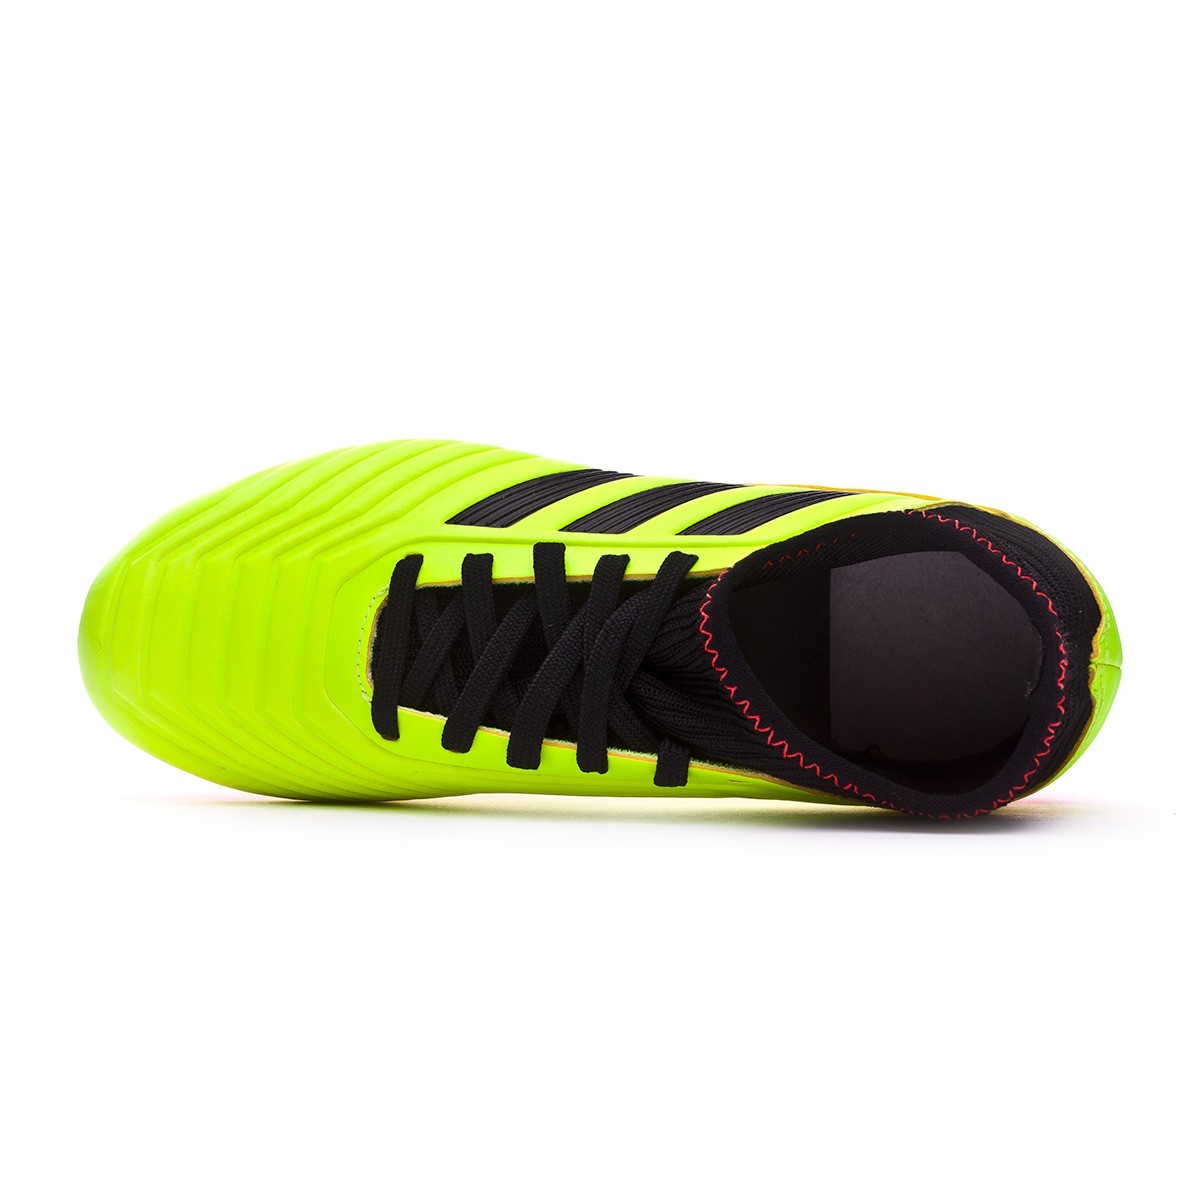 Boot adidas Predator 18.3 FG Niño Solar yellow-Black-Solar red - Soloporteros  es ahora Fútbol Emotion 17dfab5fe